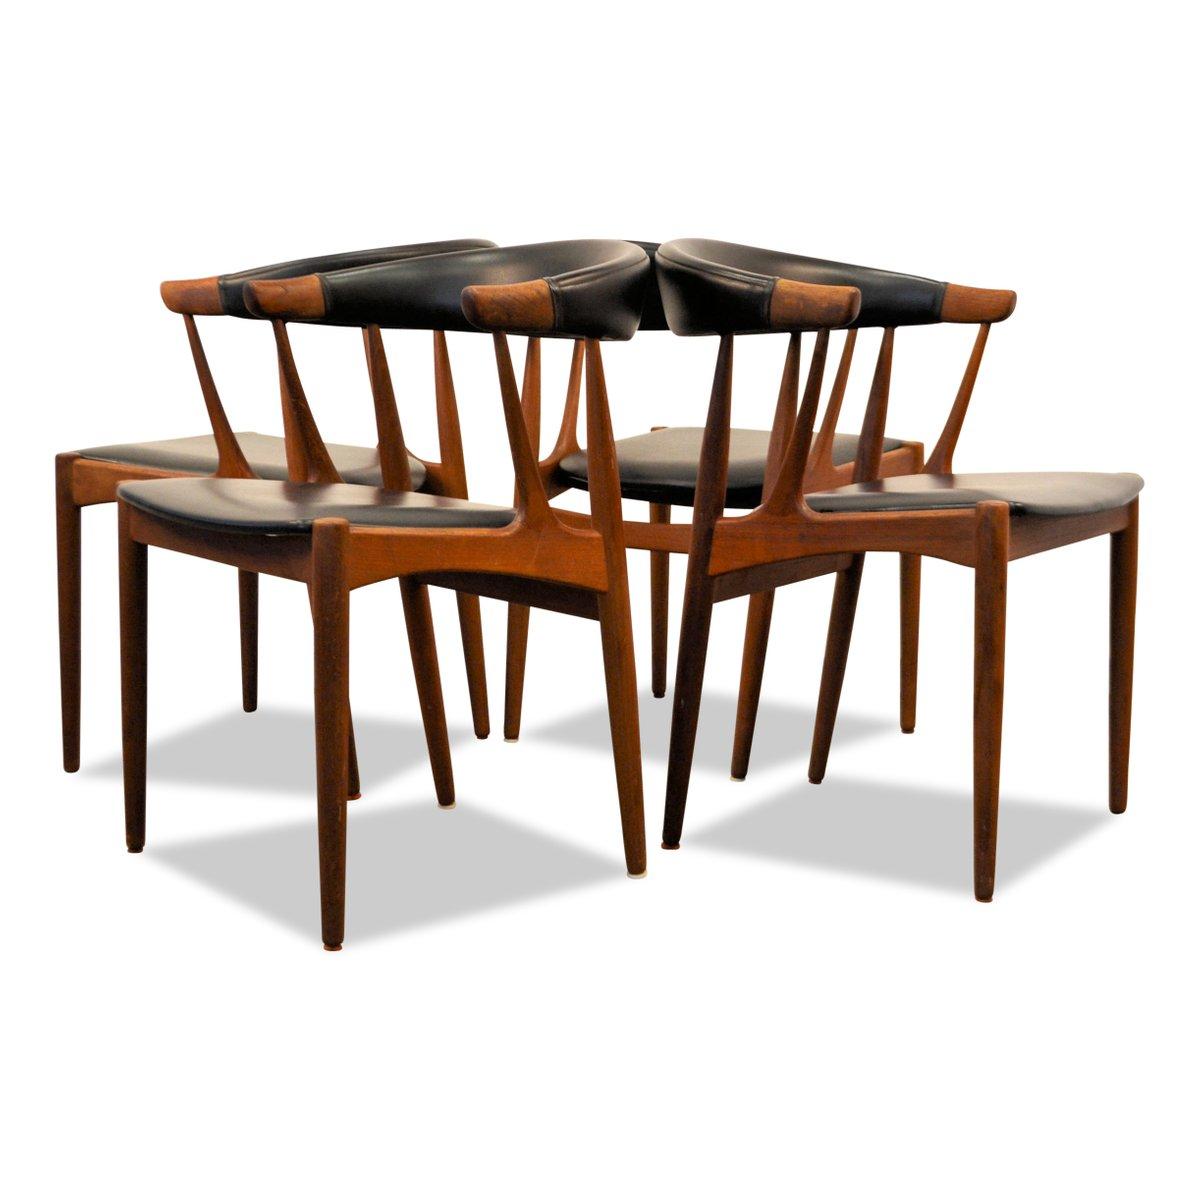 Teak Dining Chairs By Johannes Andersen For Andersen